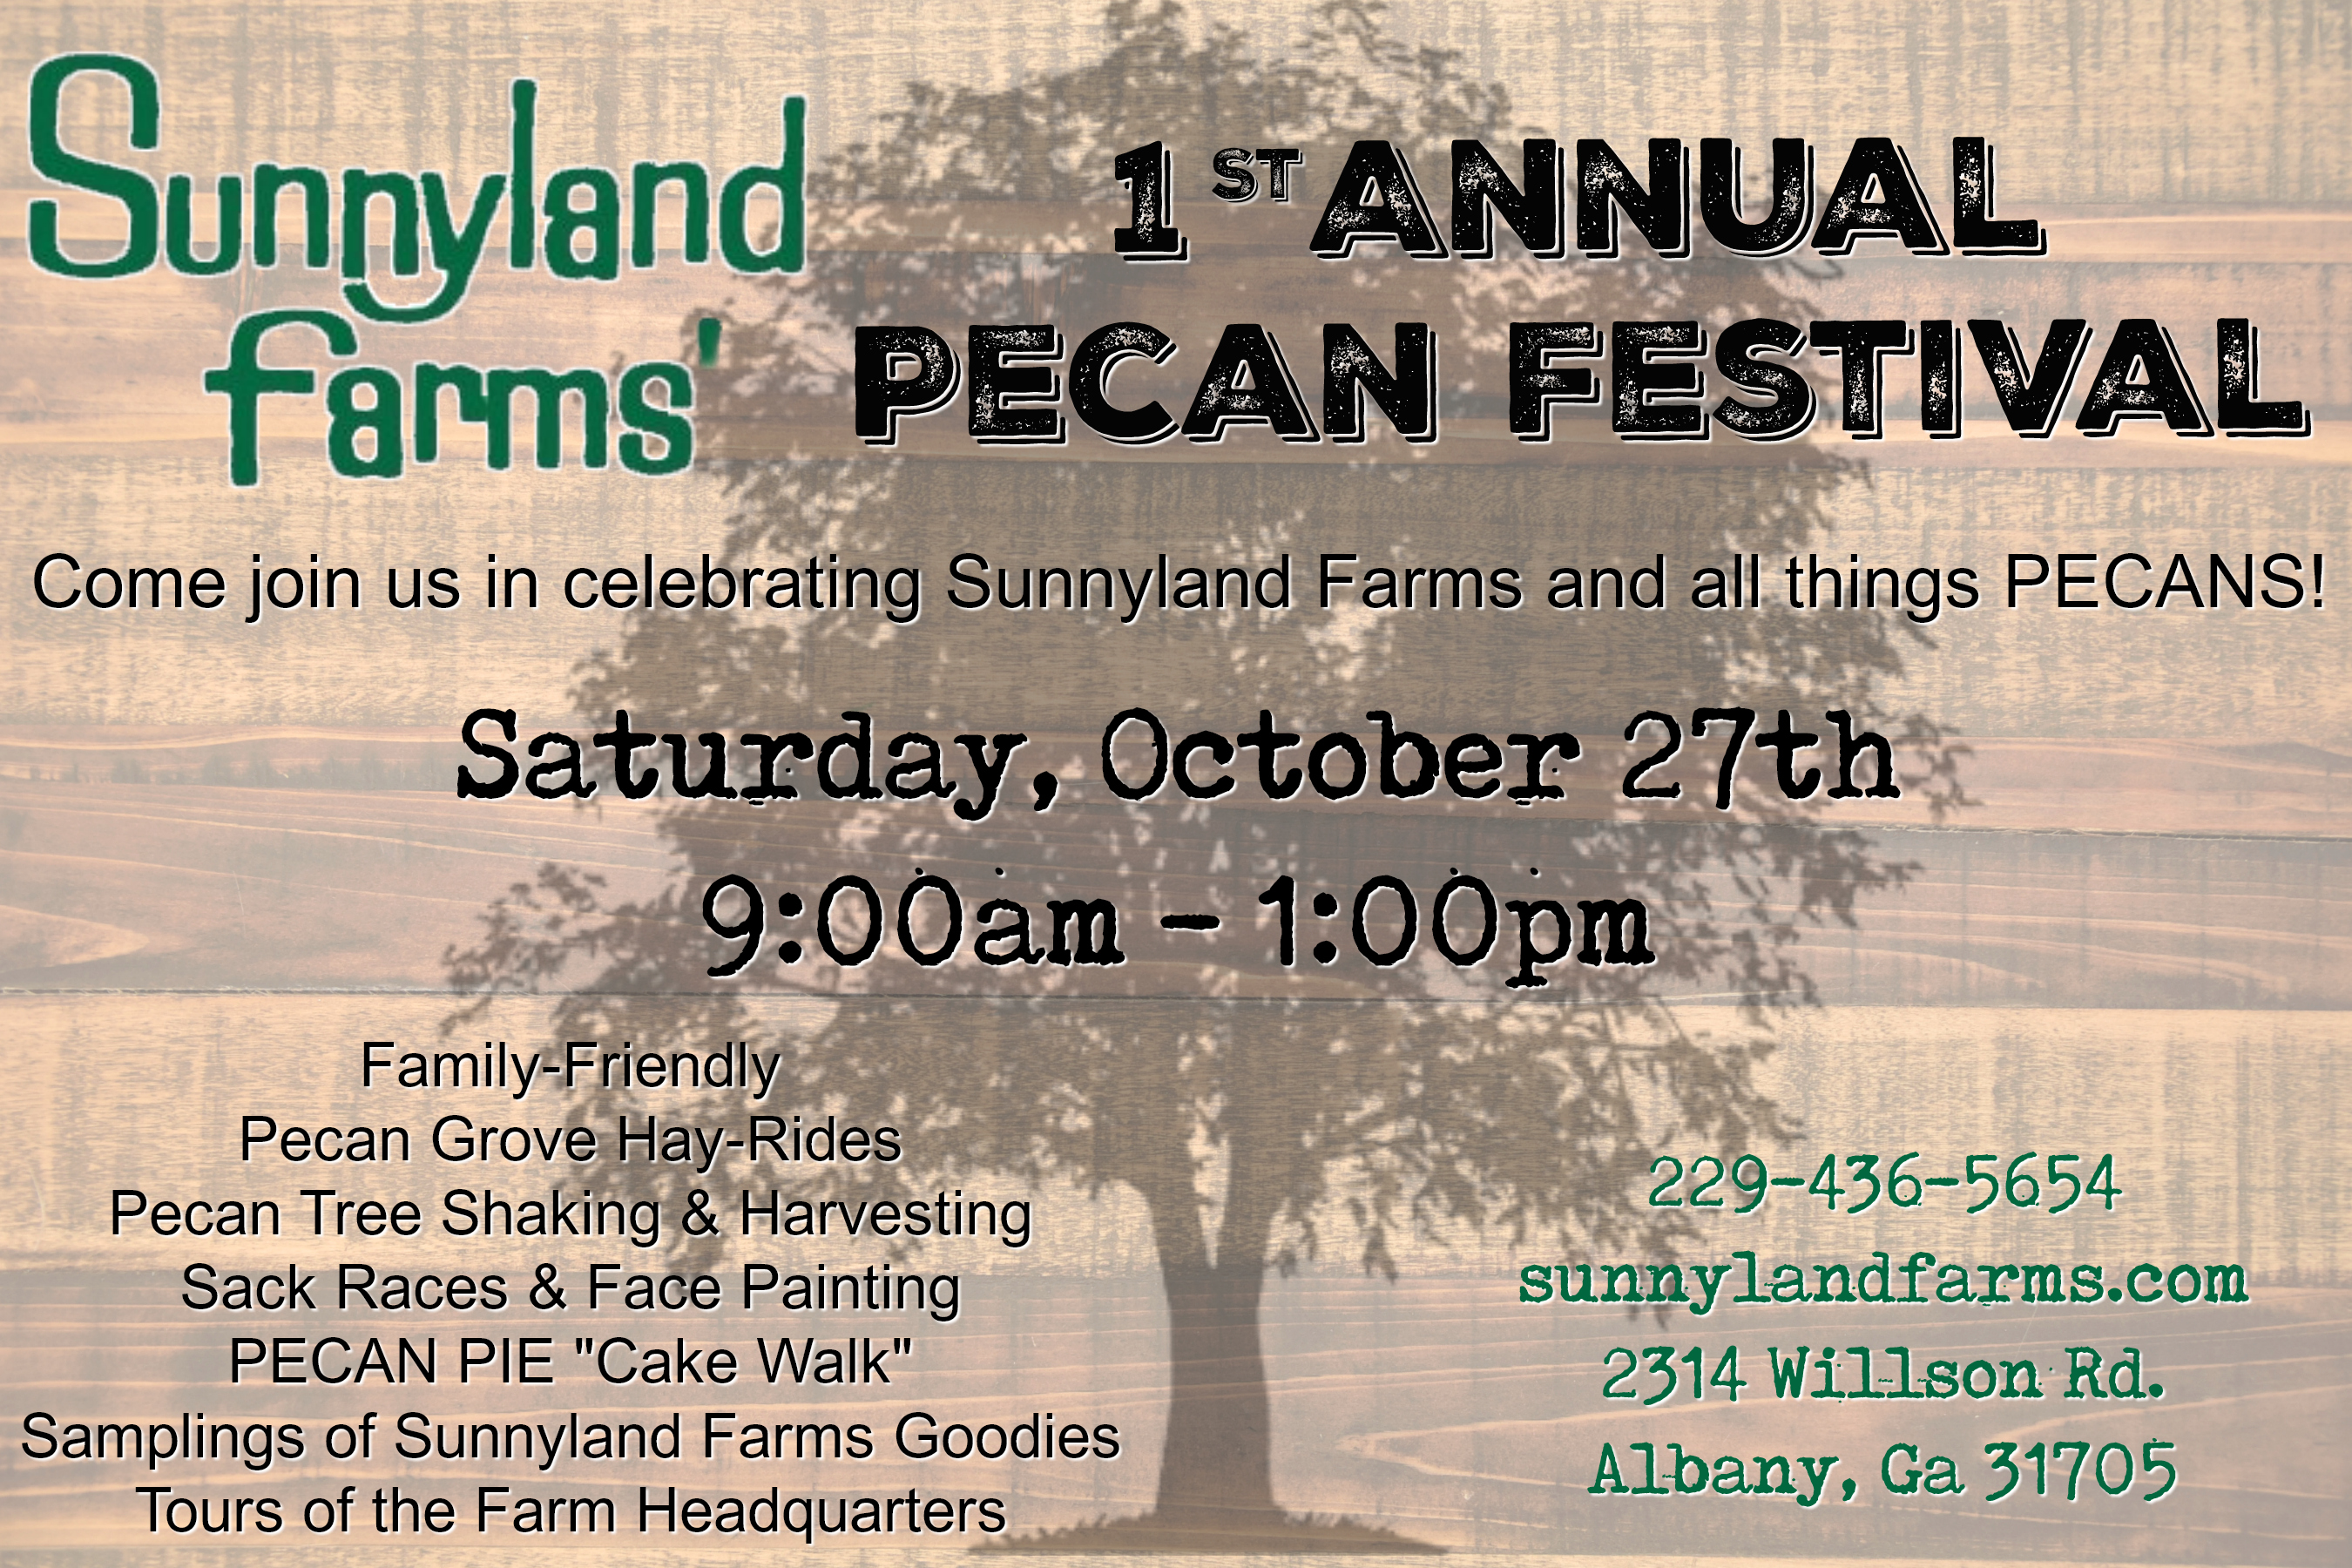 Sunnyland Farms Pecan Festival